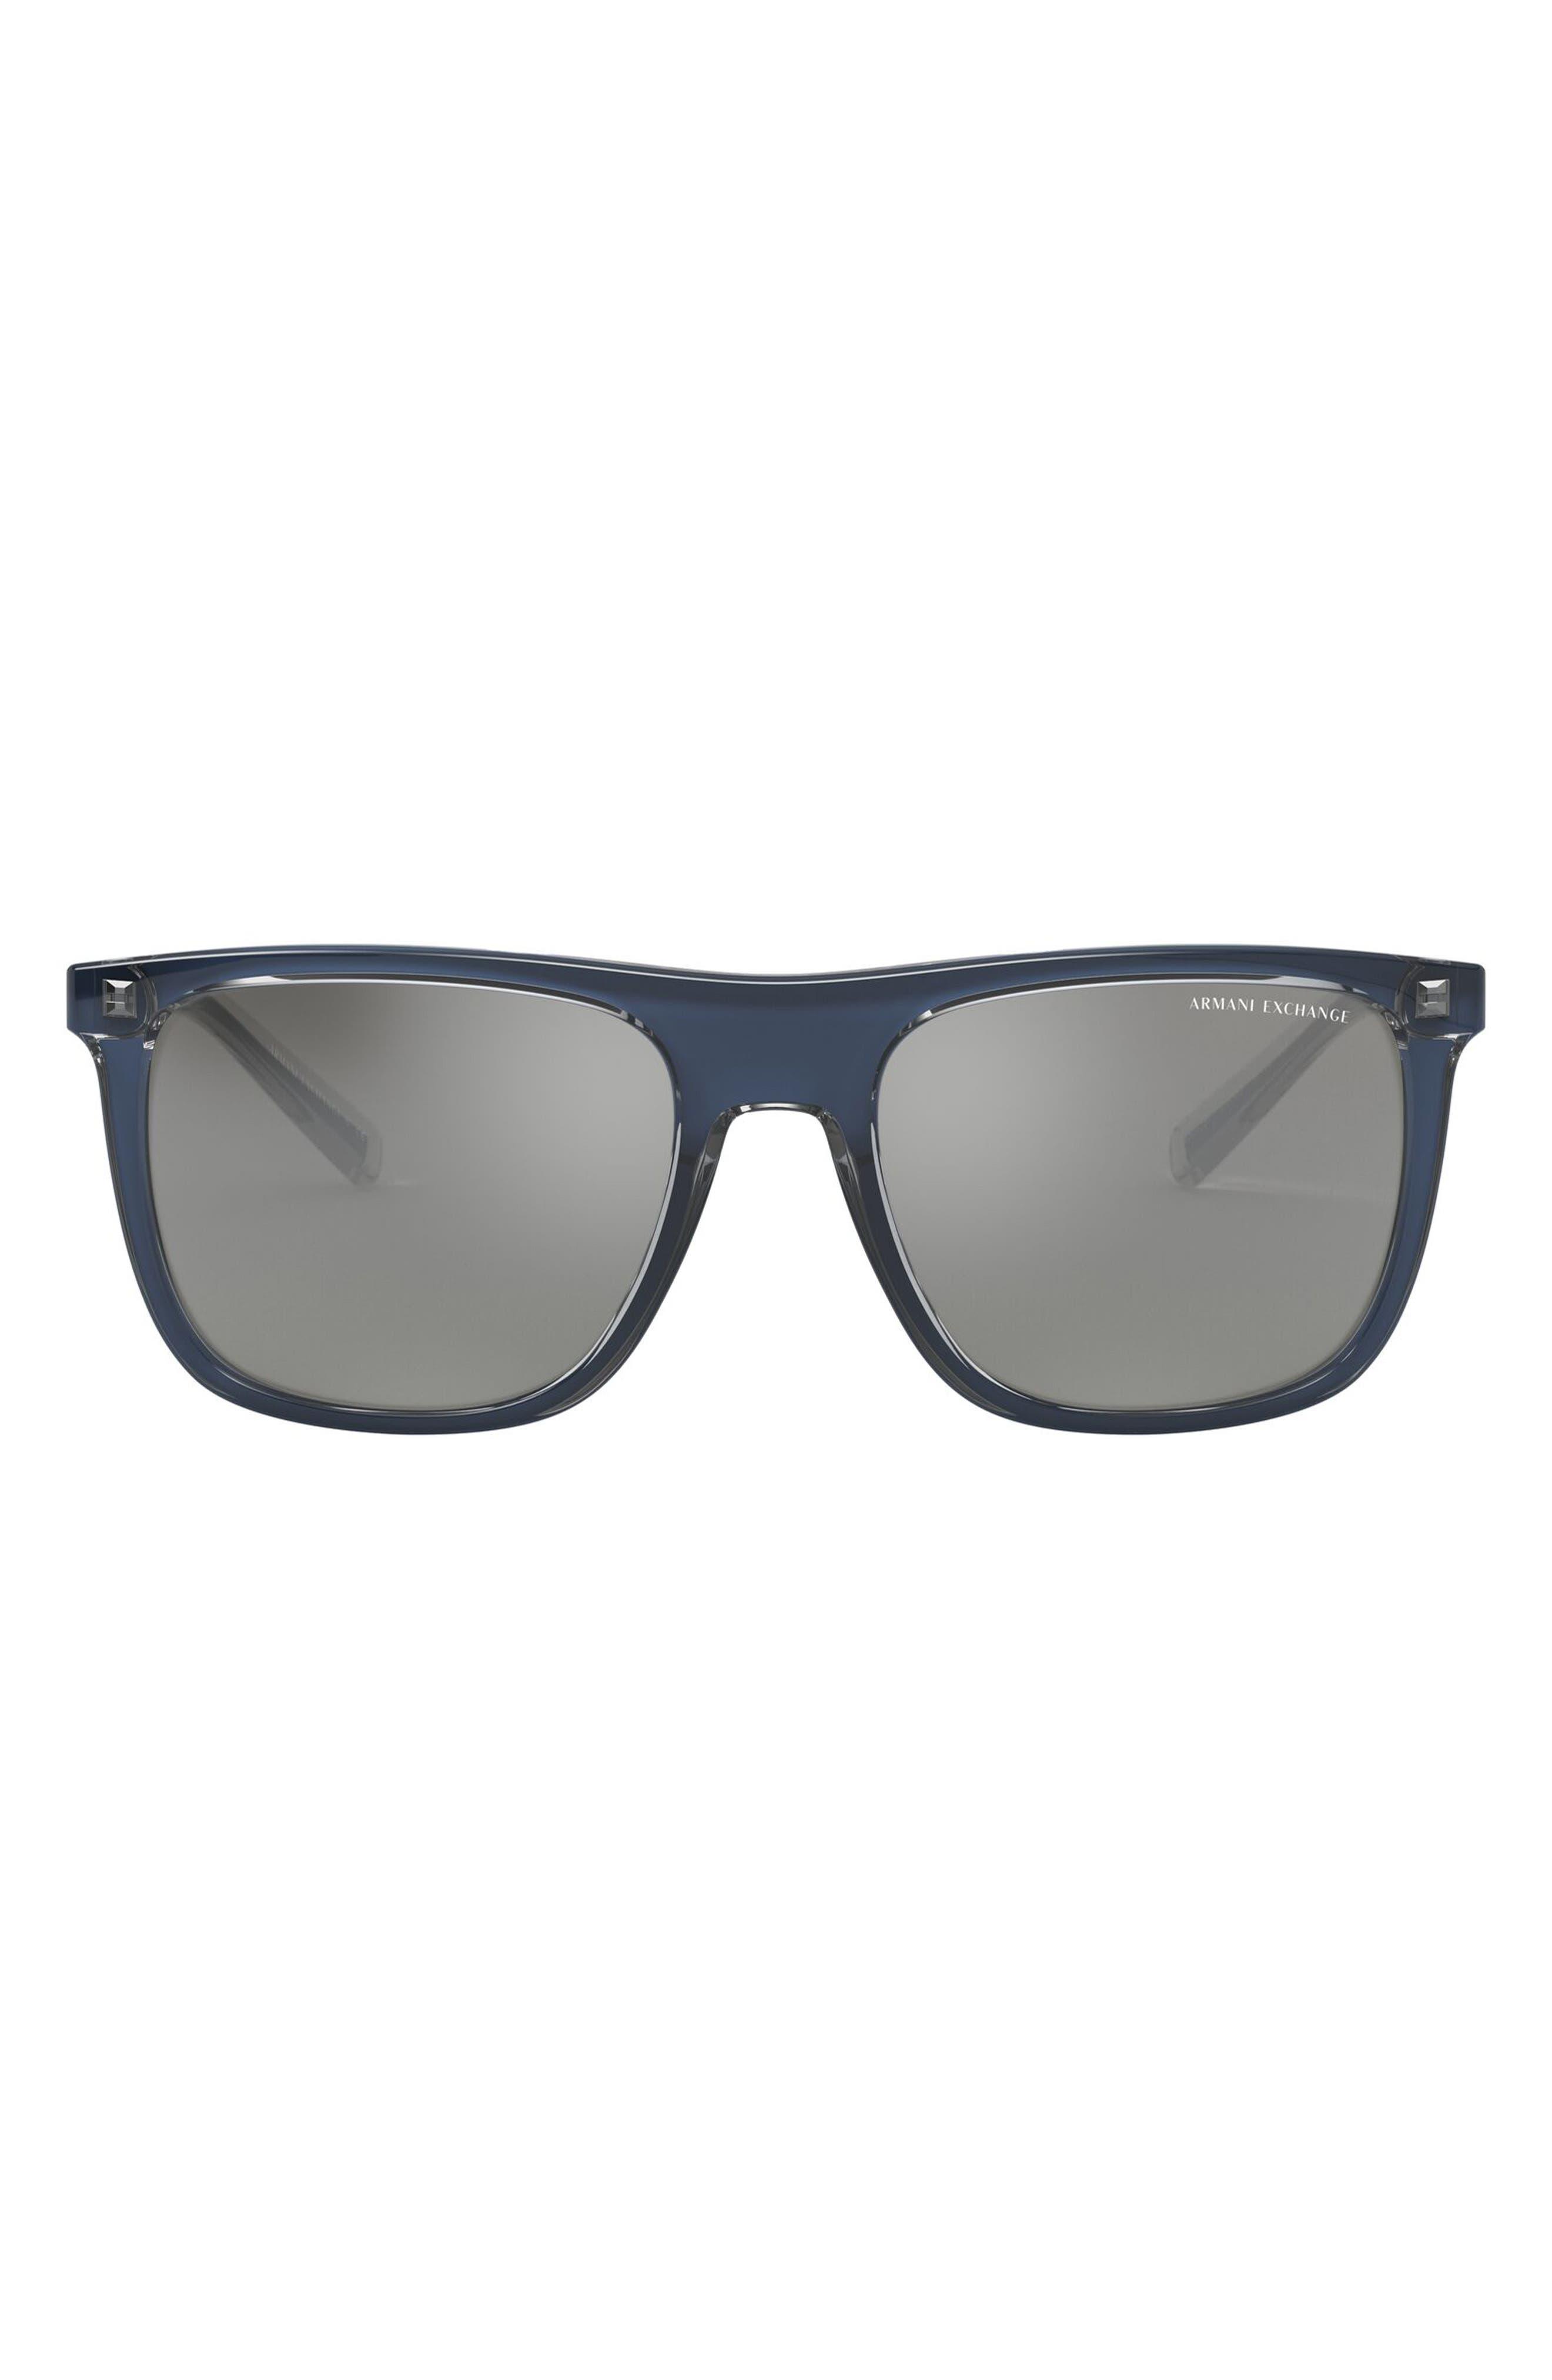 63mm Oversize Sunglasses